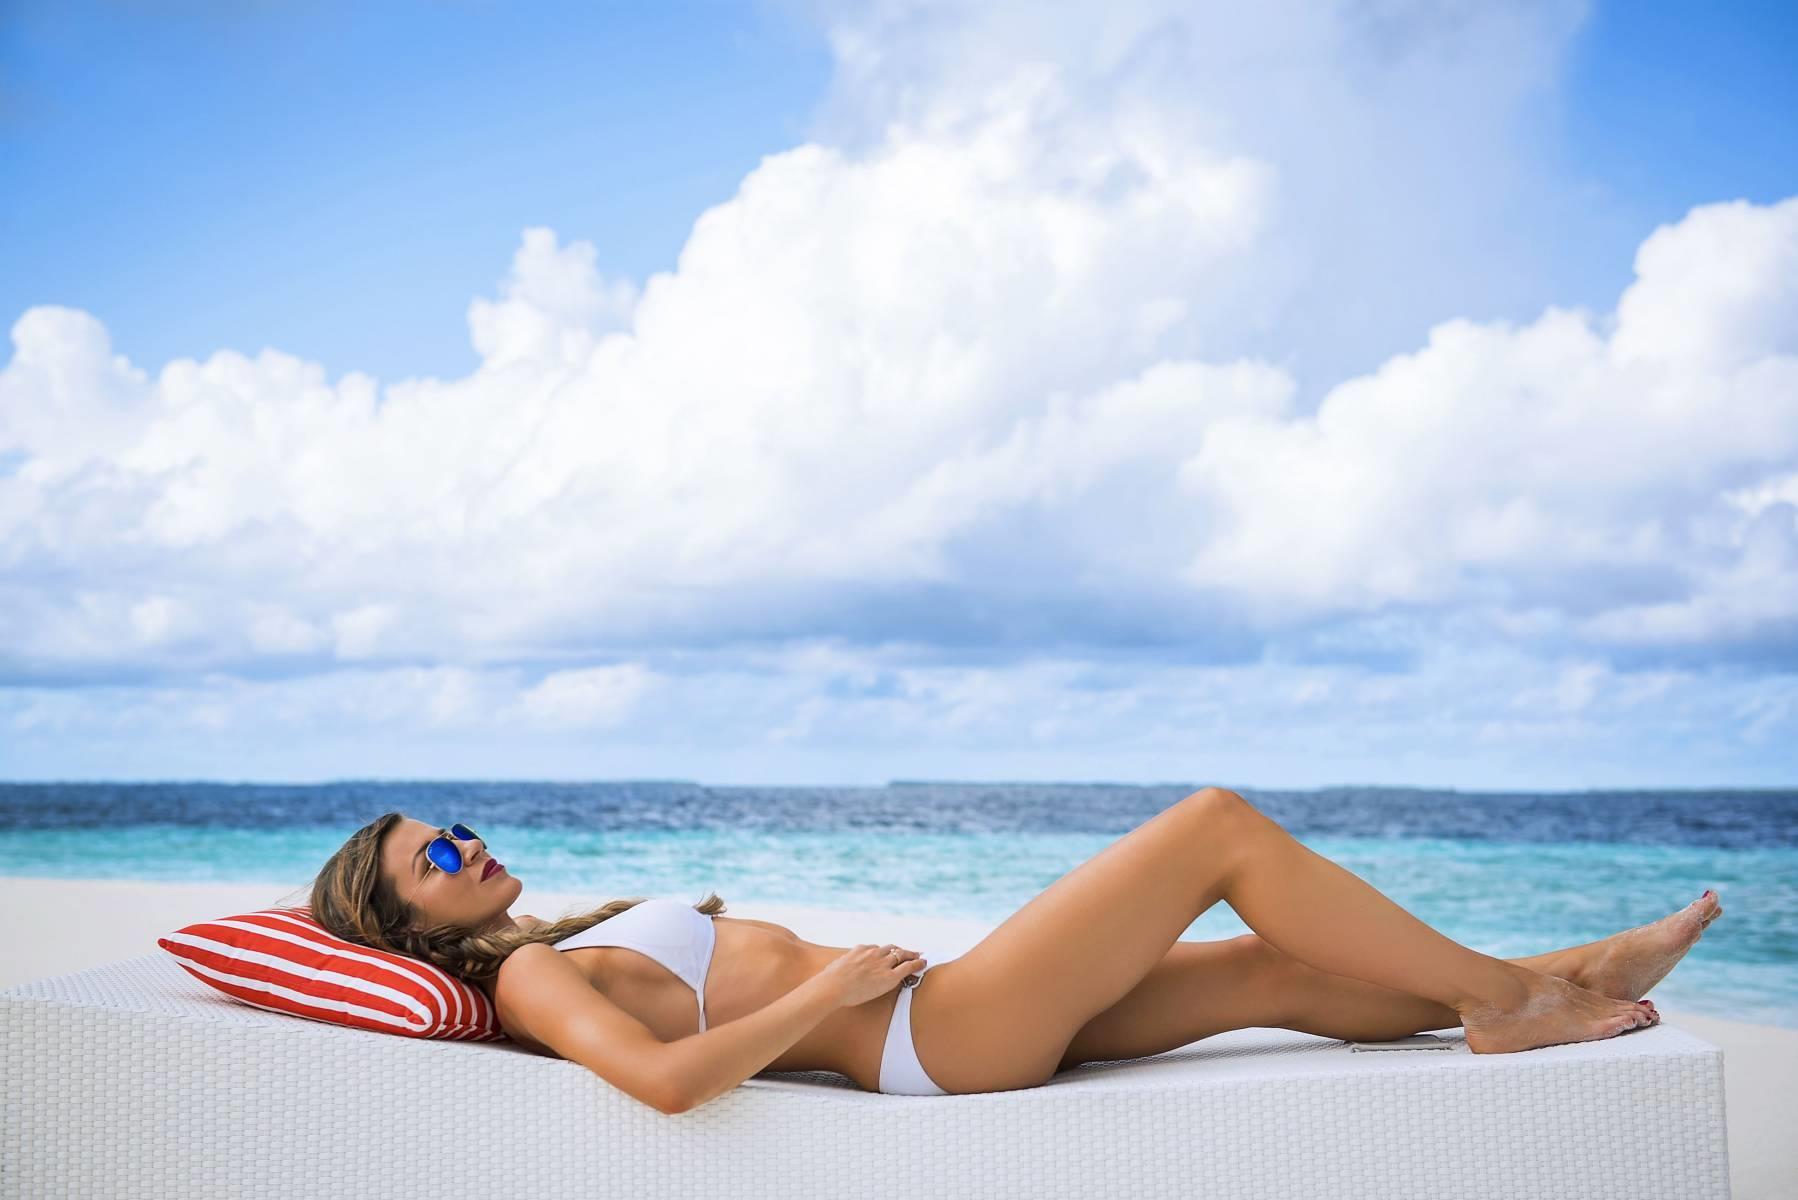 mercure-maldives-kooddoo-resort-genel-006